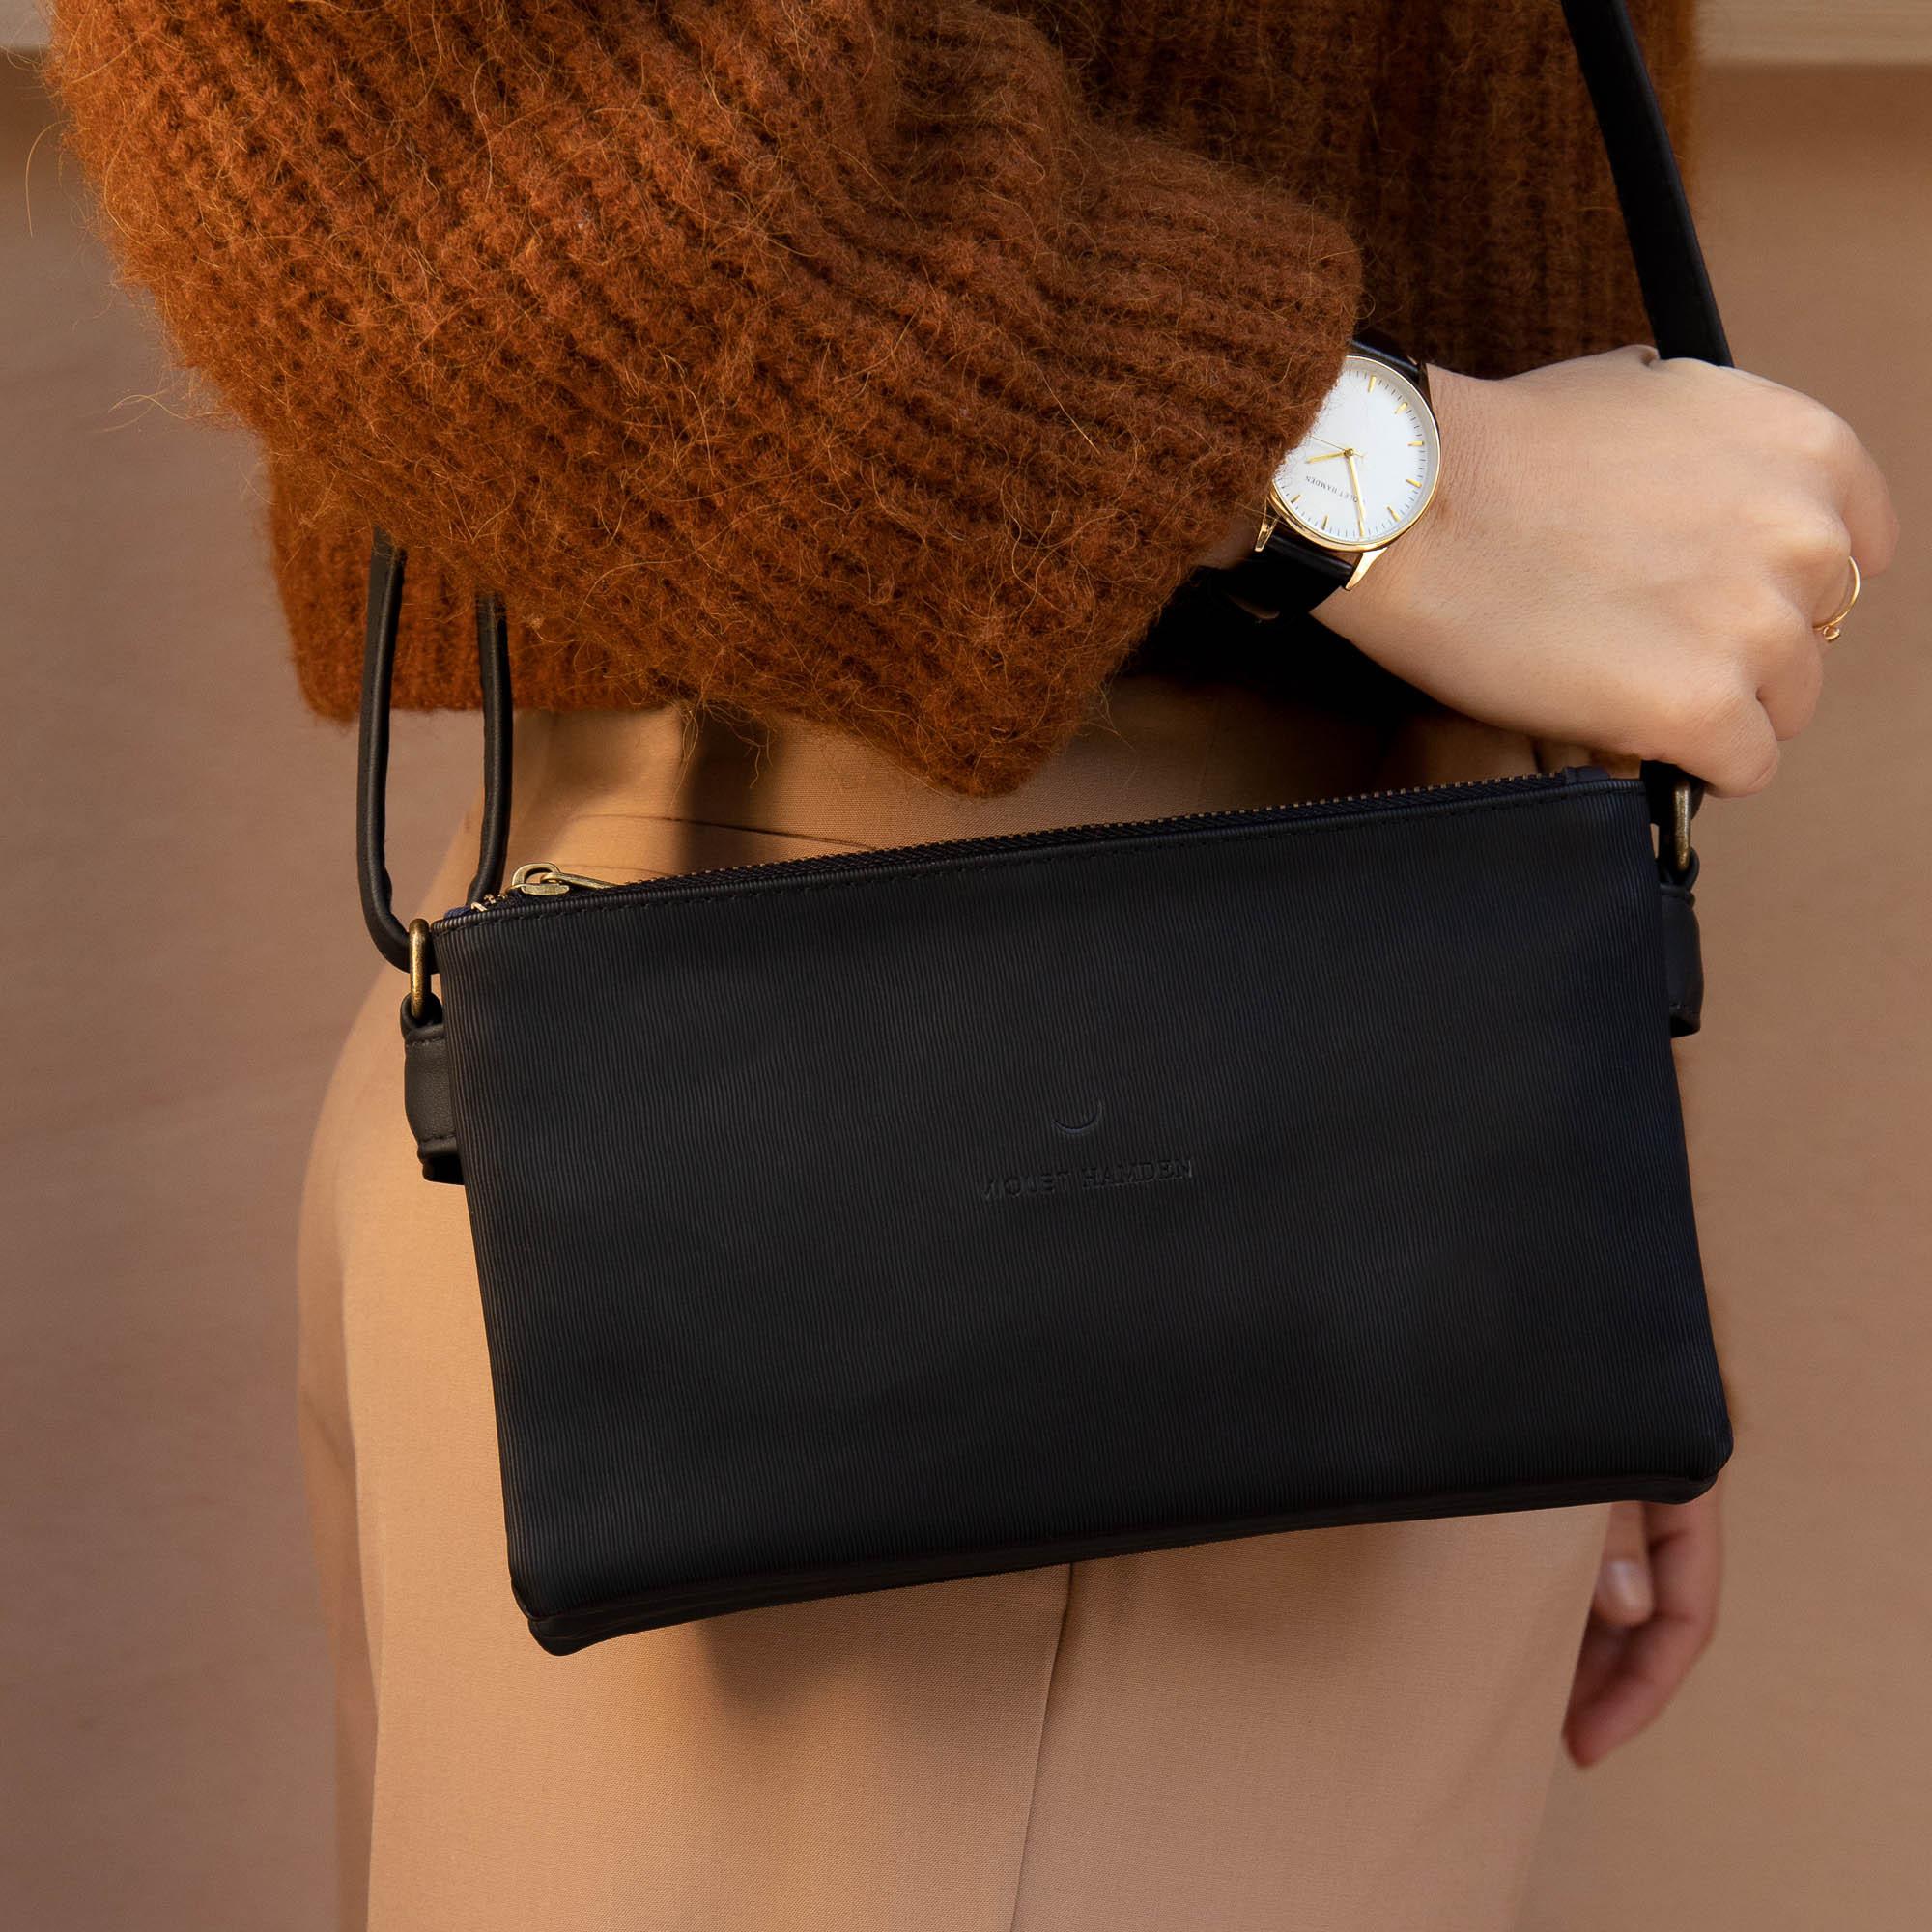 Violet Hamden Essential Bag Black Crossbody VH25003